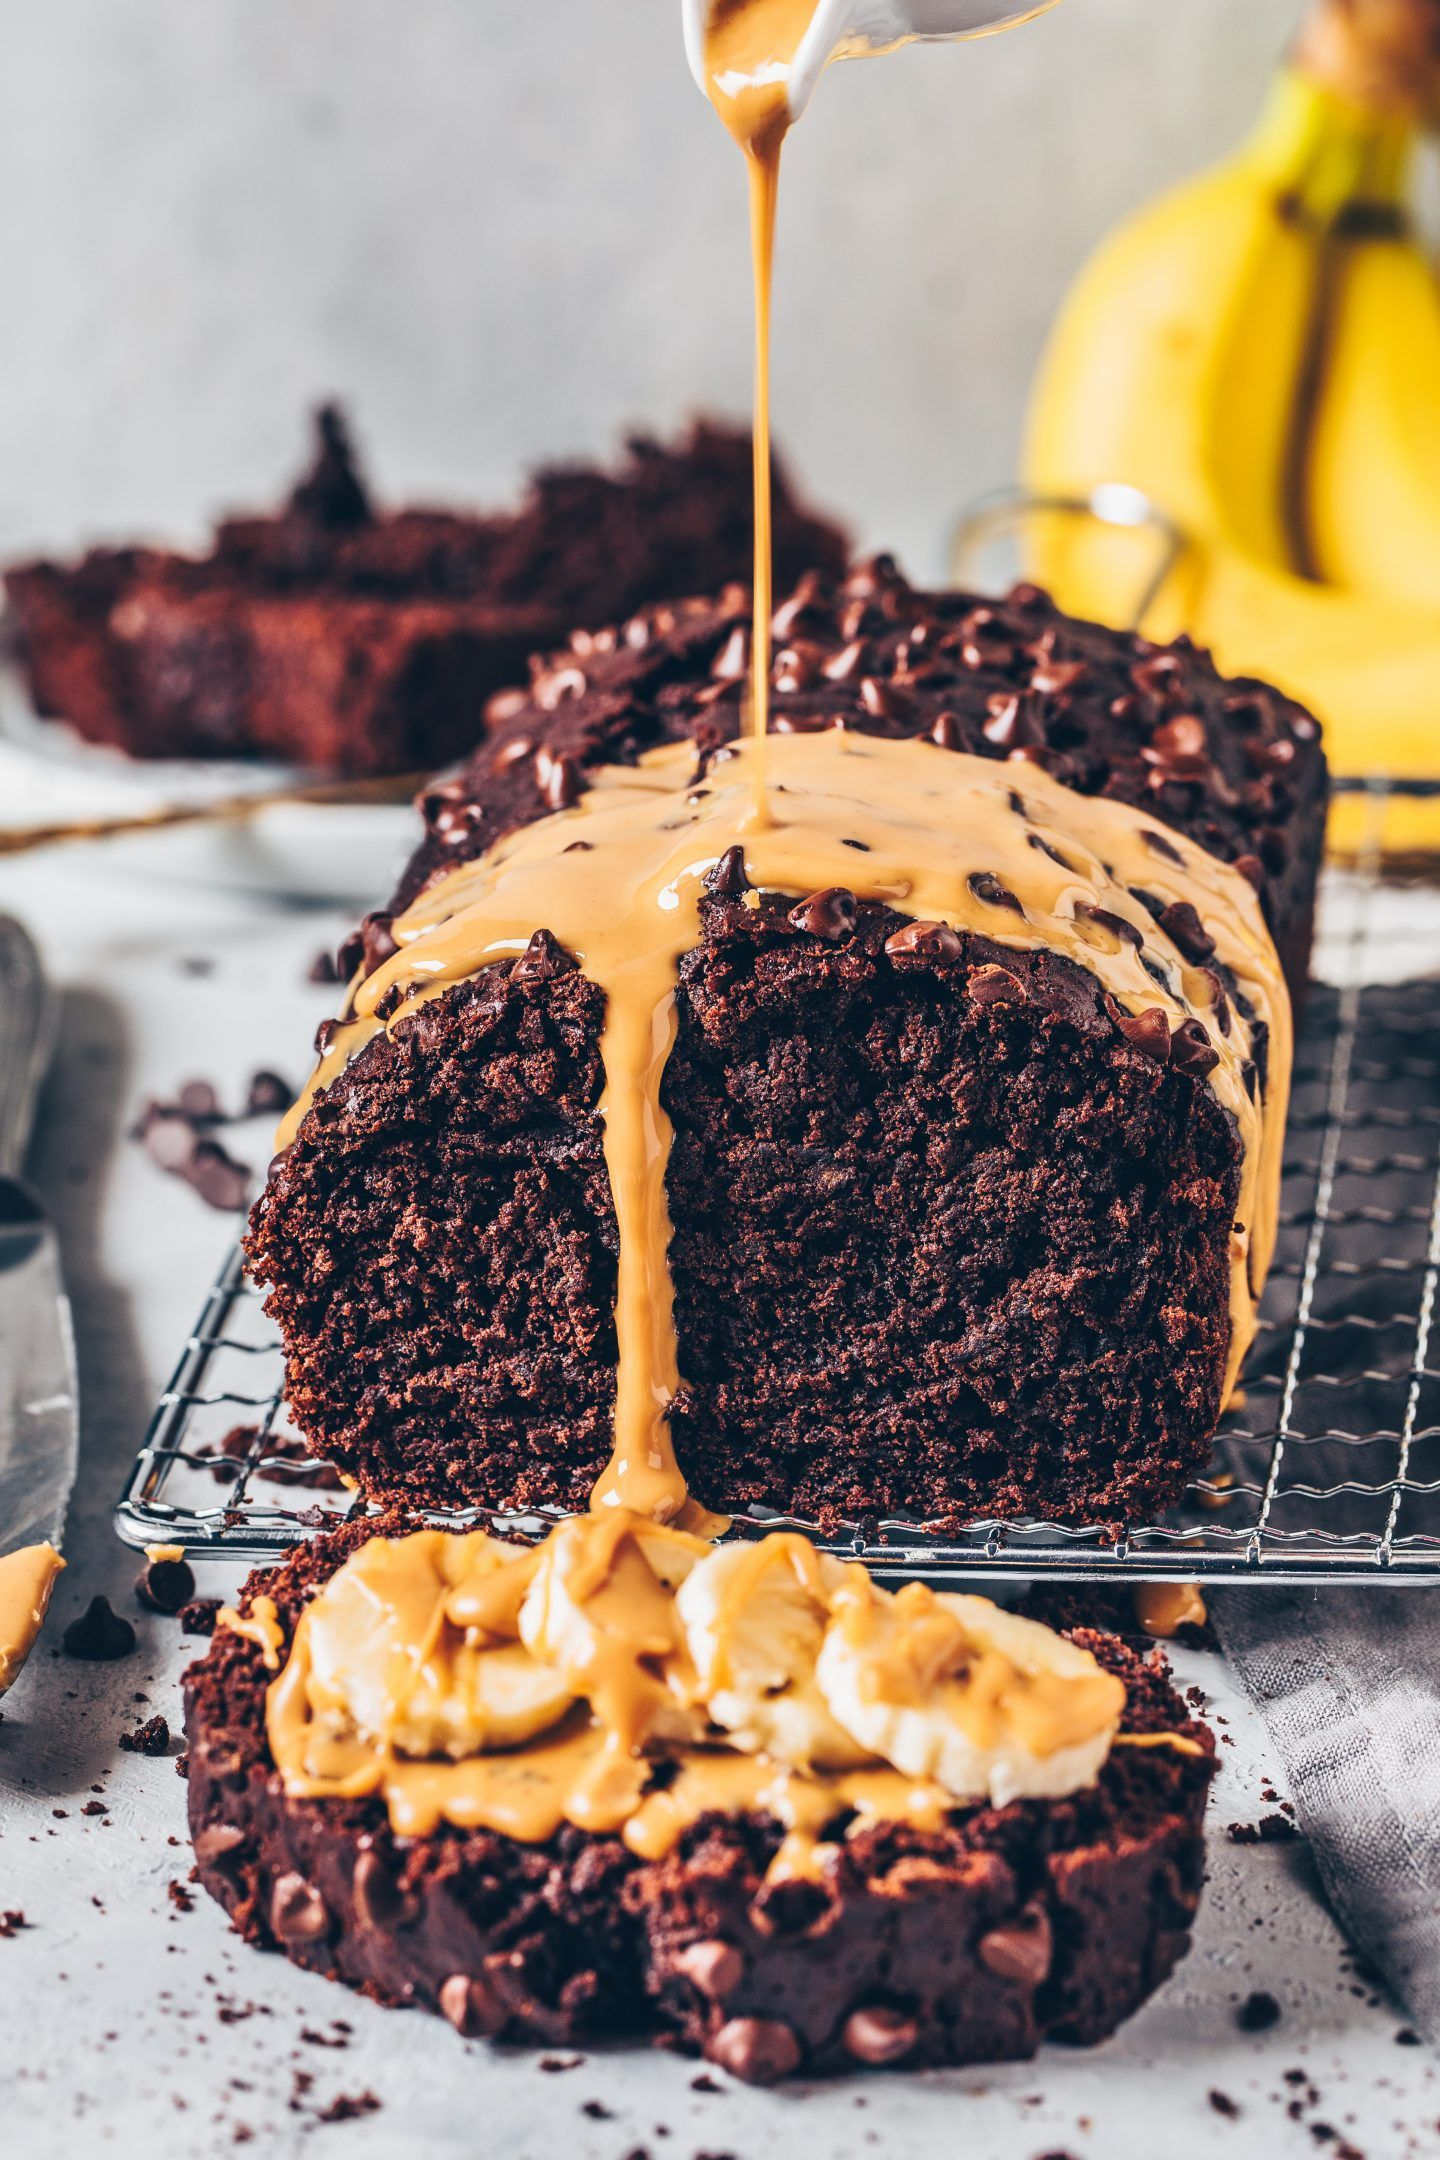 Das beste Vegane Schoko-Bananenbrot - Bianca Zapatka | Rezepte #peanutrecipes